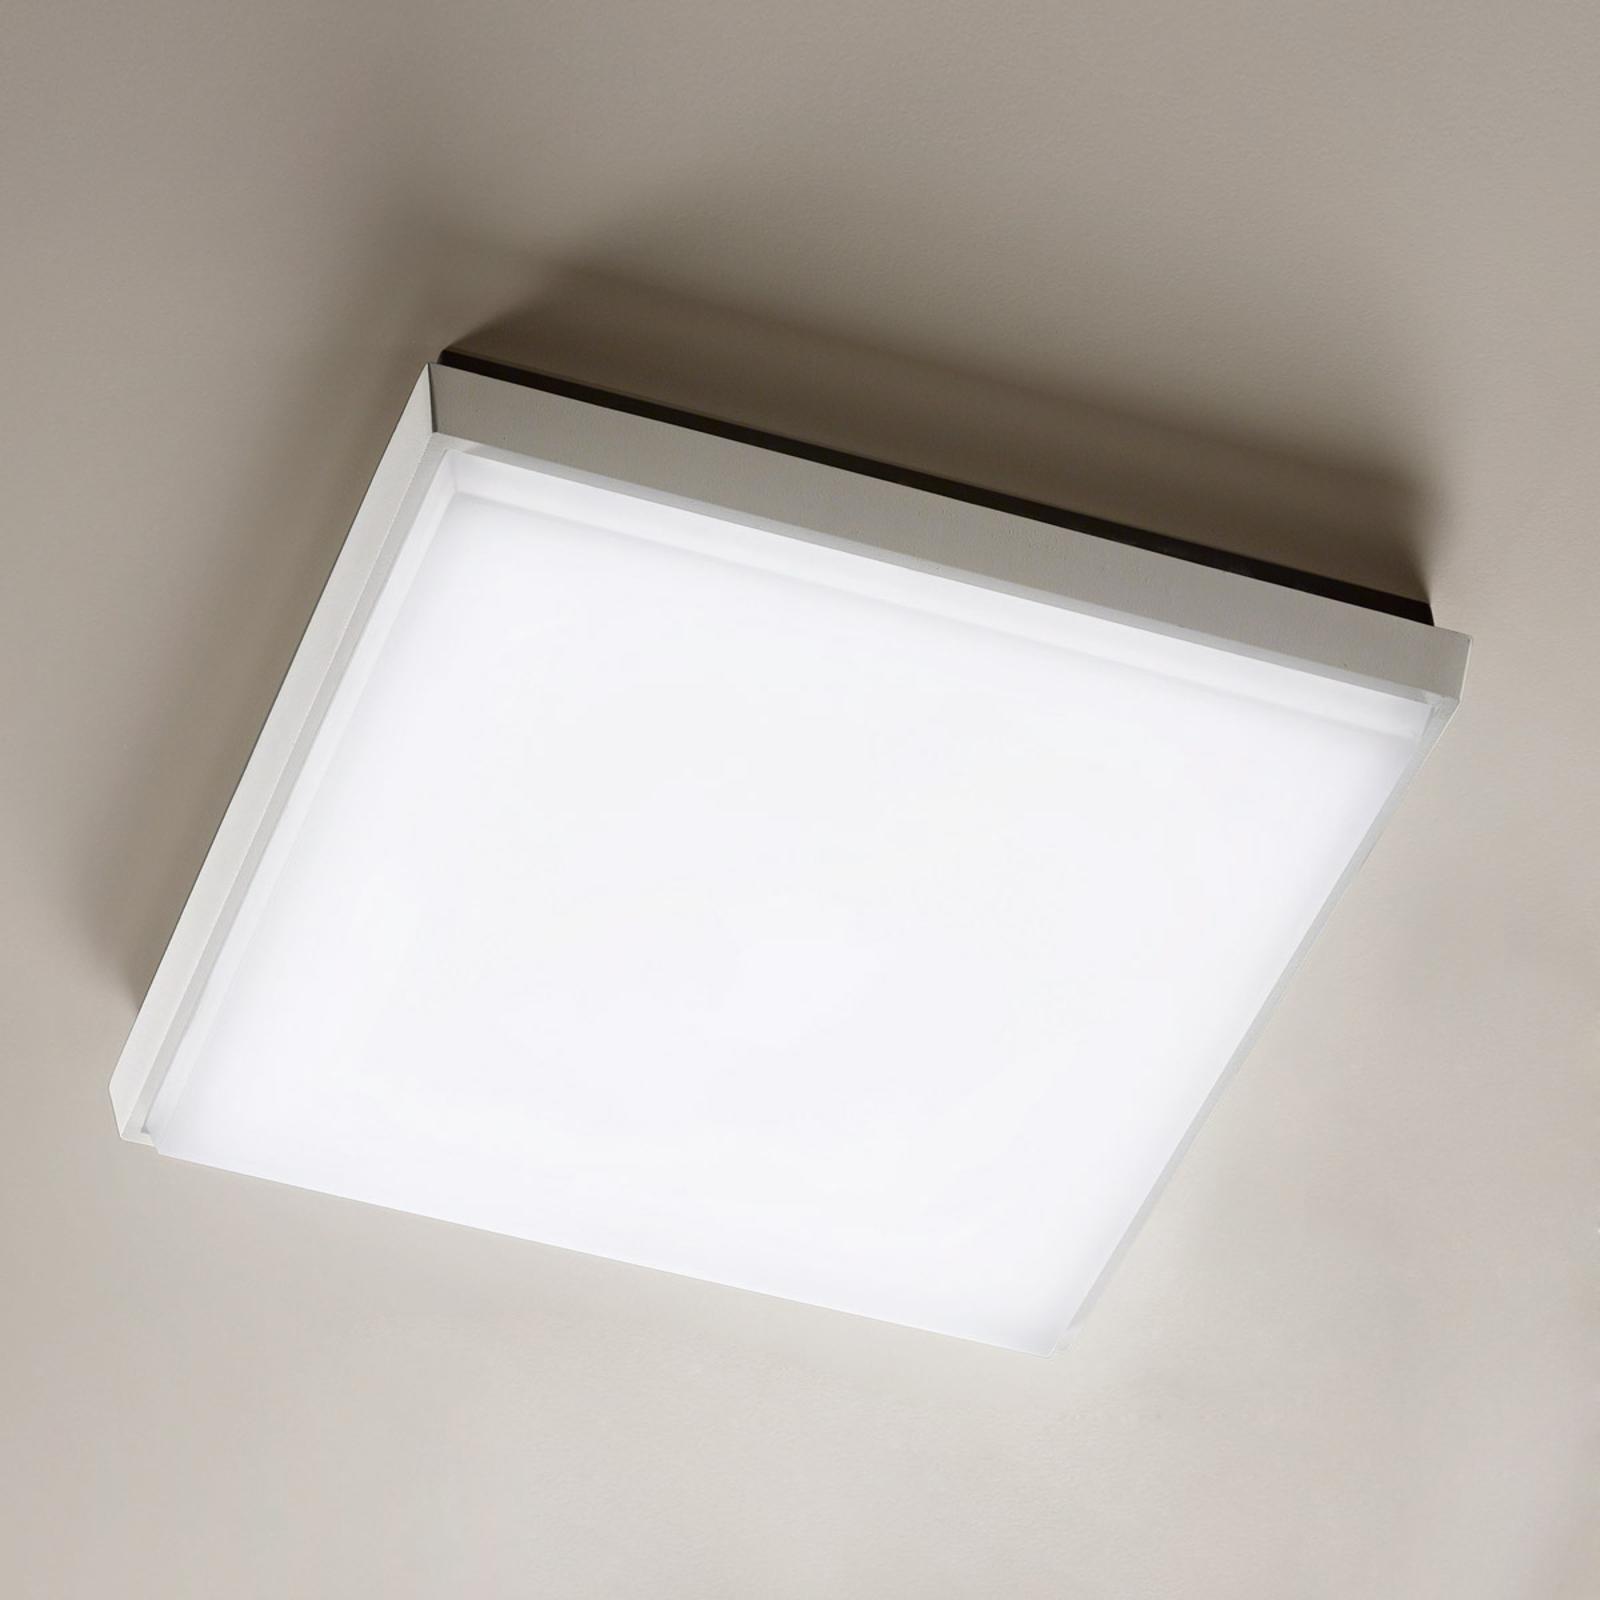 Angular Desdy LED outdoor light_3502512_1